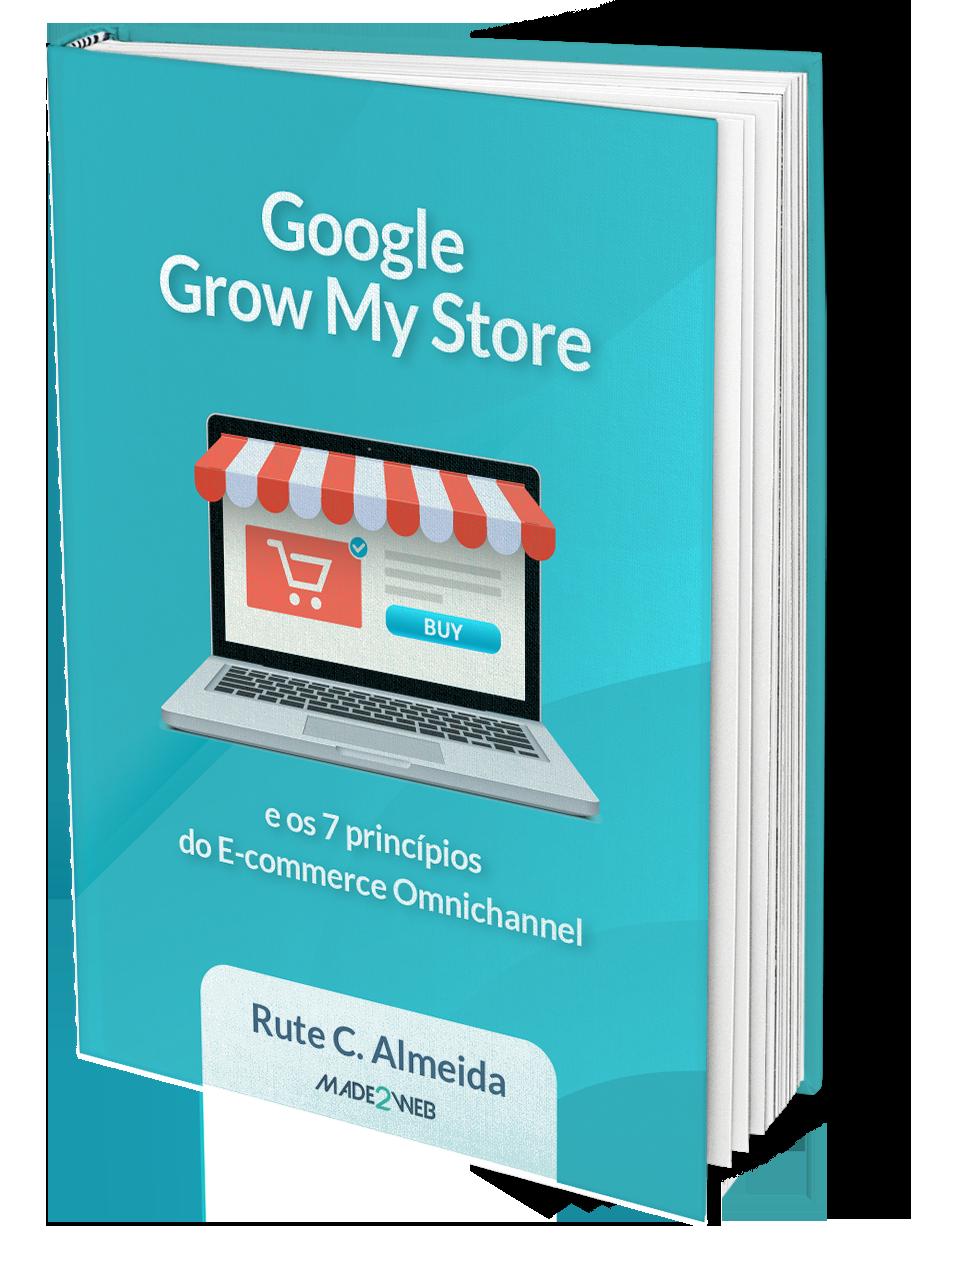 Google Grow My Store e os 7 princípios do E-commerce Omnichannel